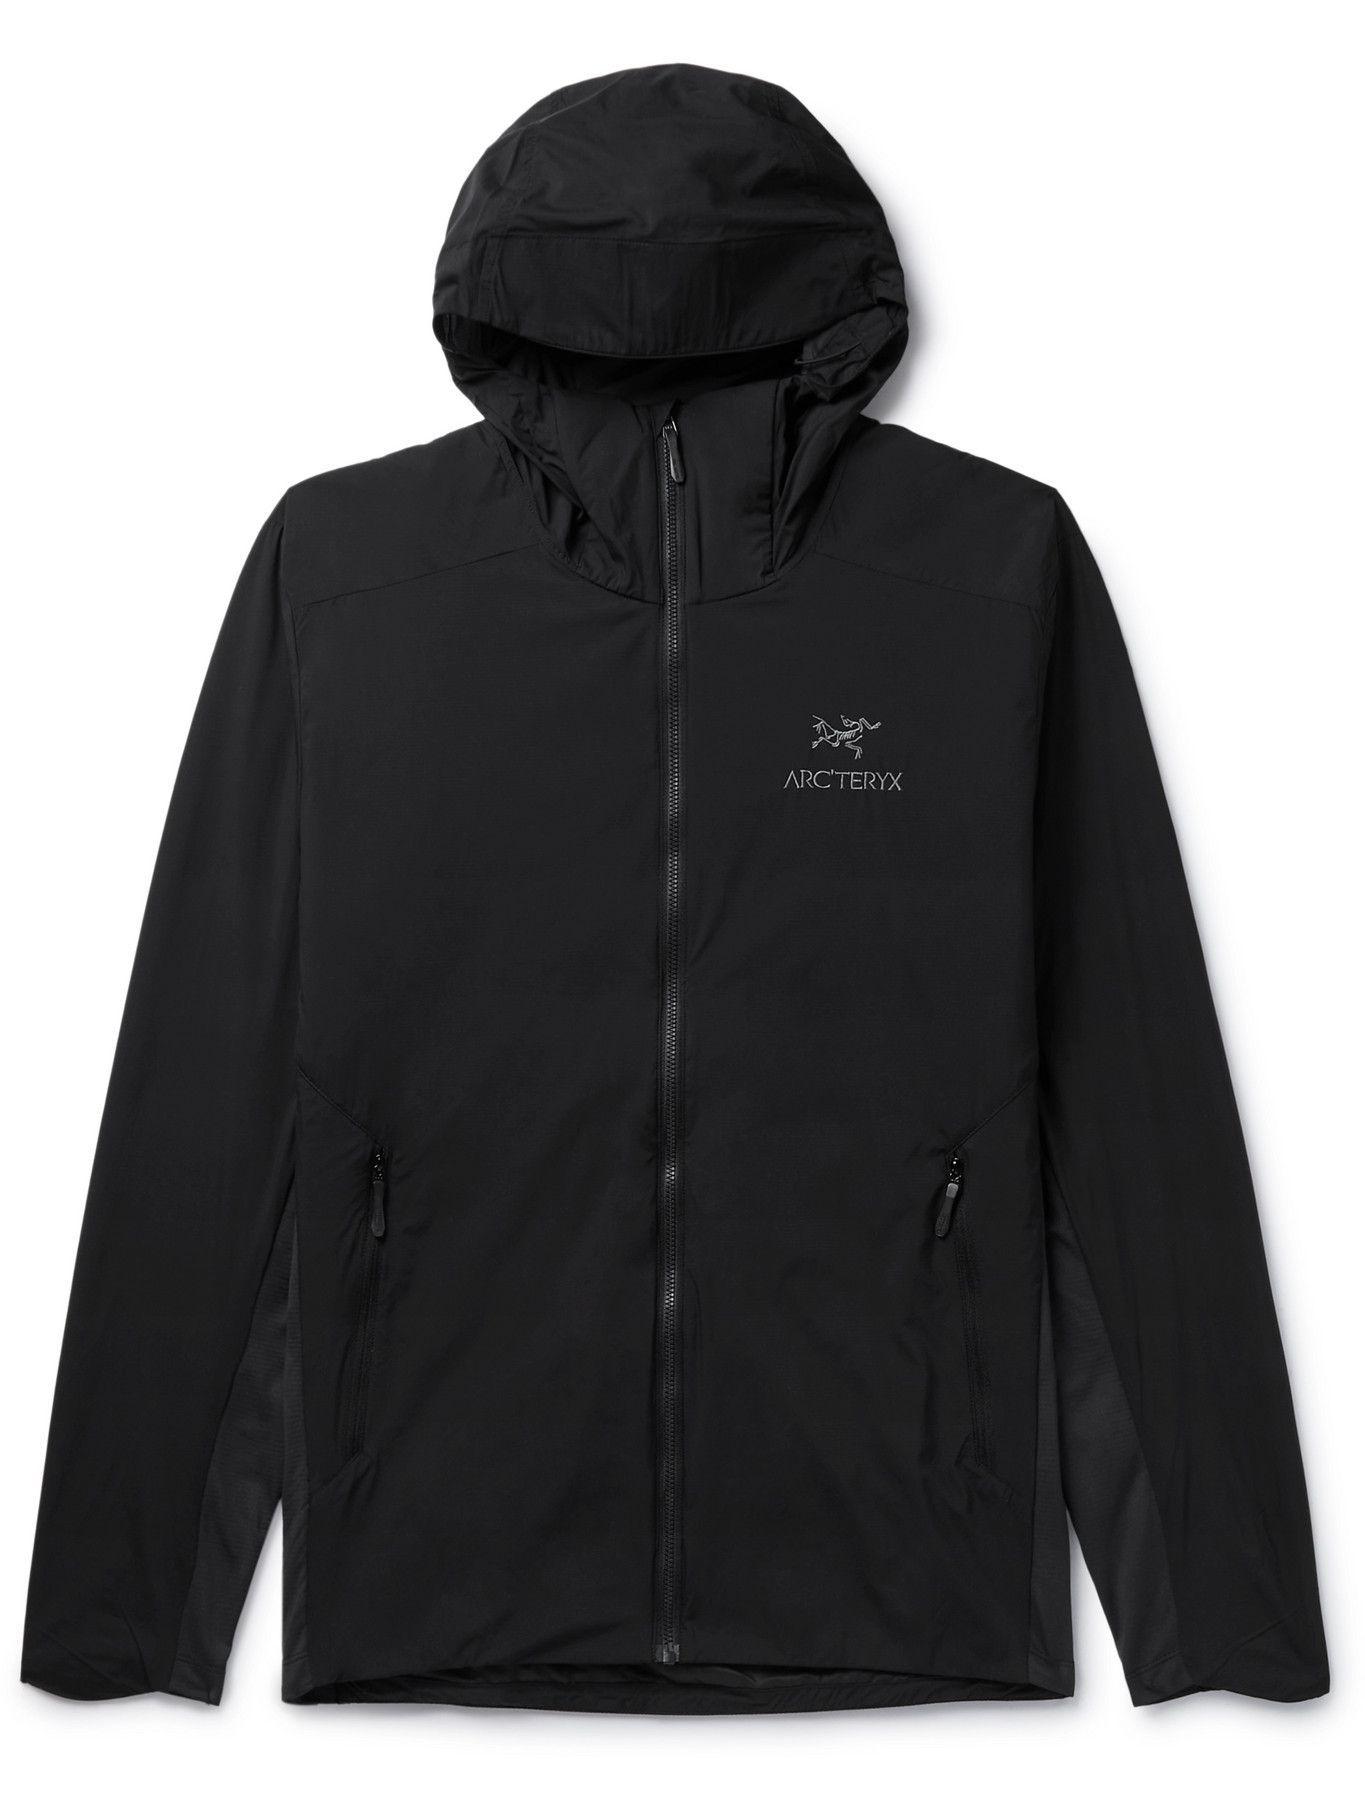 Photo: ARC'TERYX - Atom SL Nylon Hooded Jacket - Black